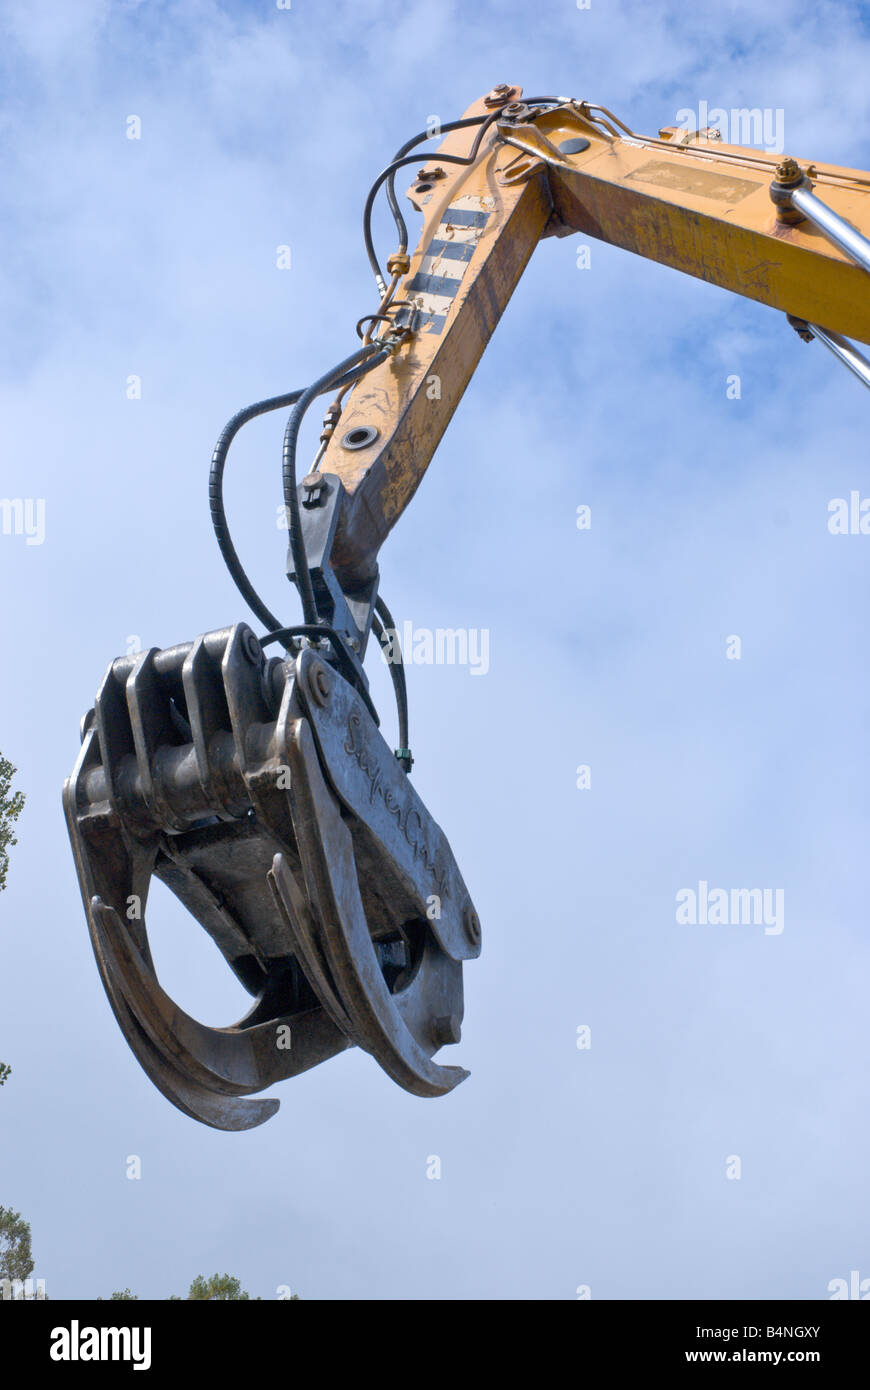 Junkyard : Super Grip mechanical hand used to grab ahold of junk ...